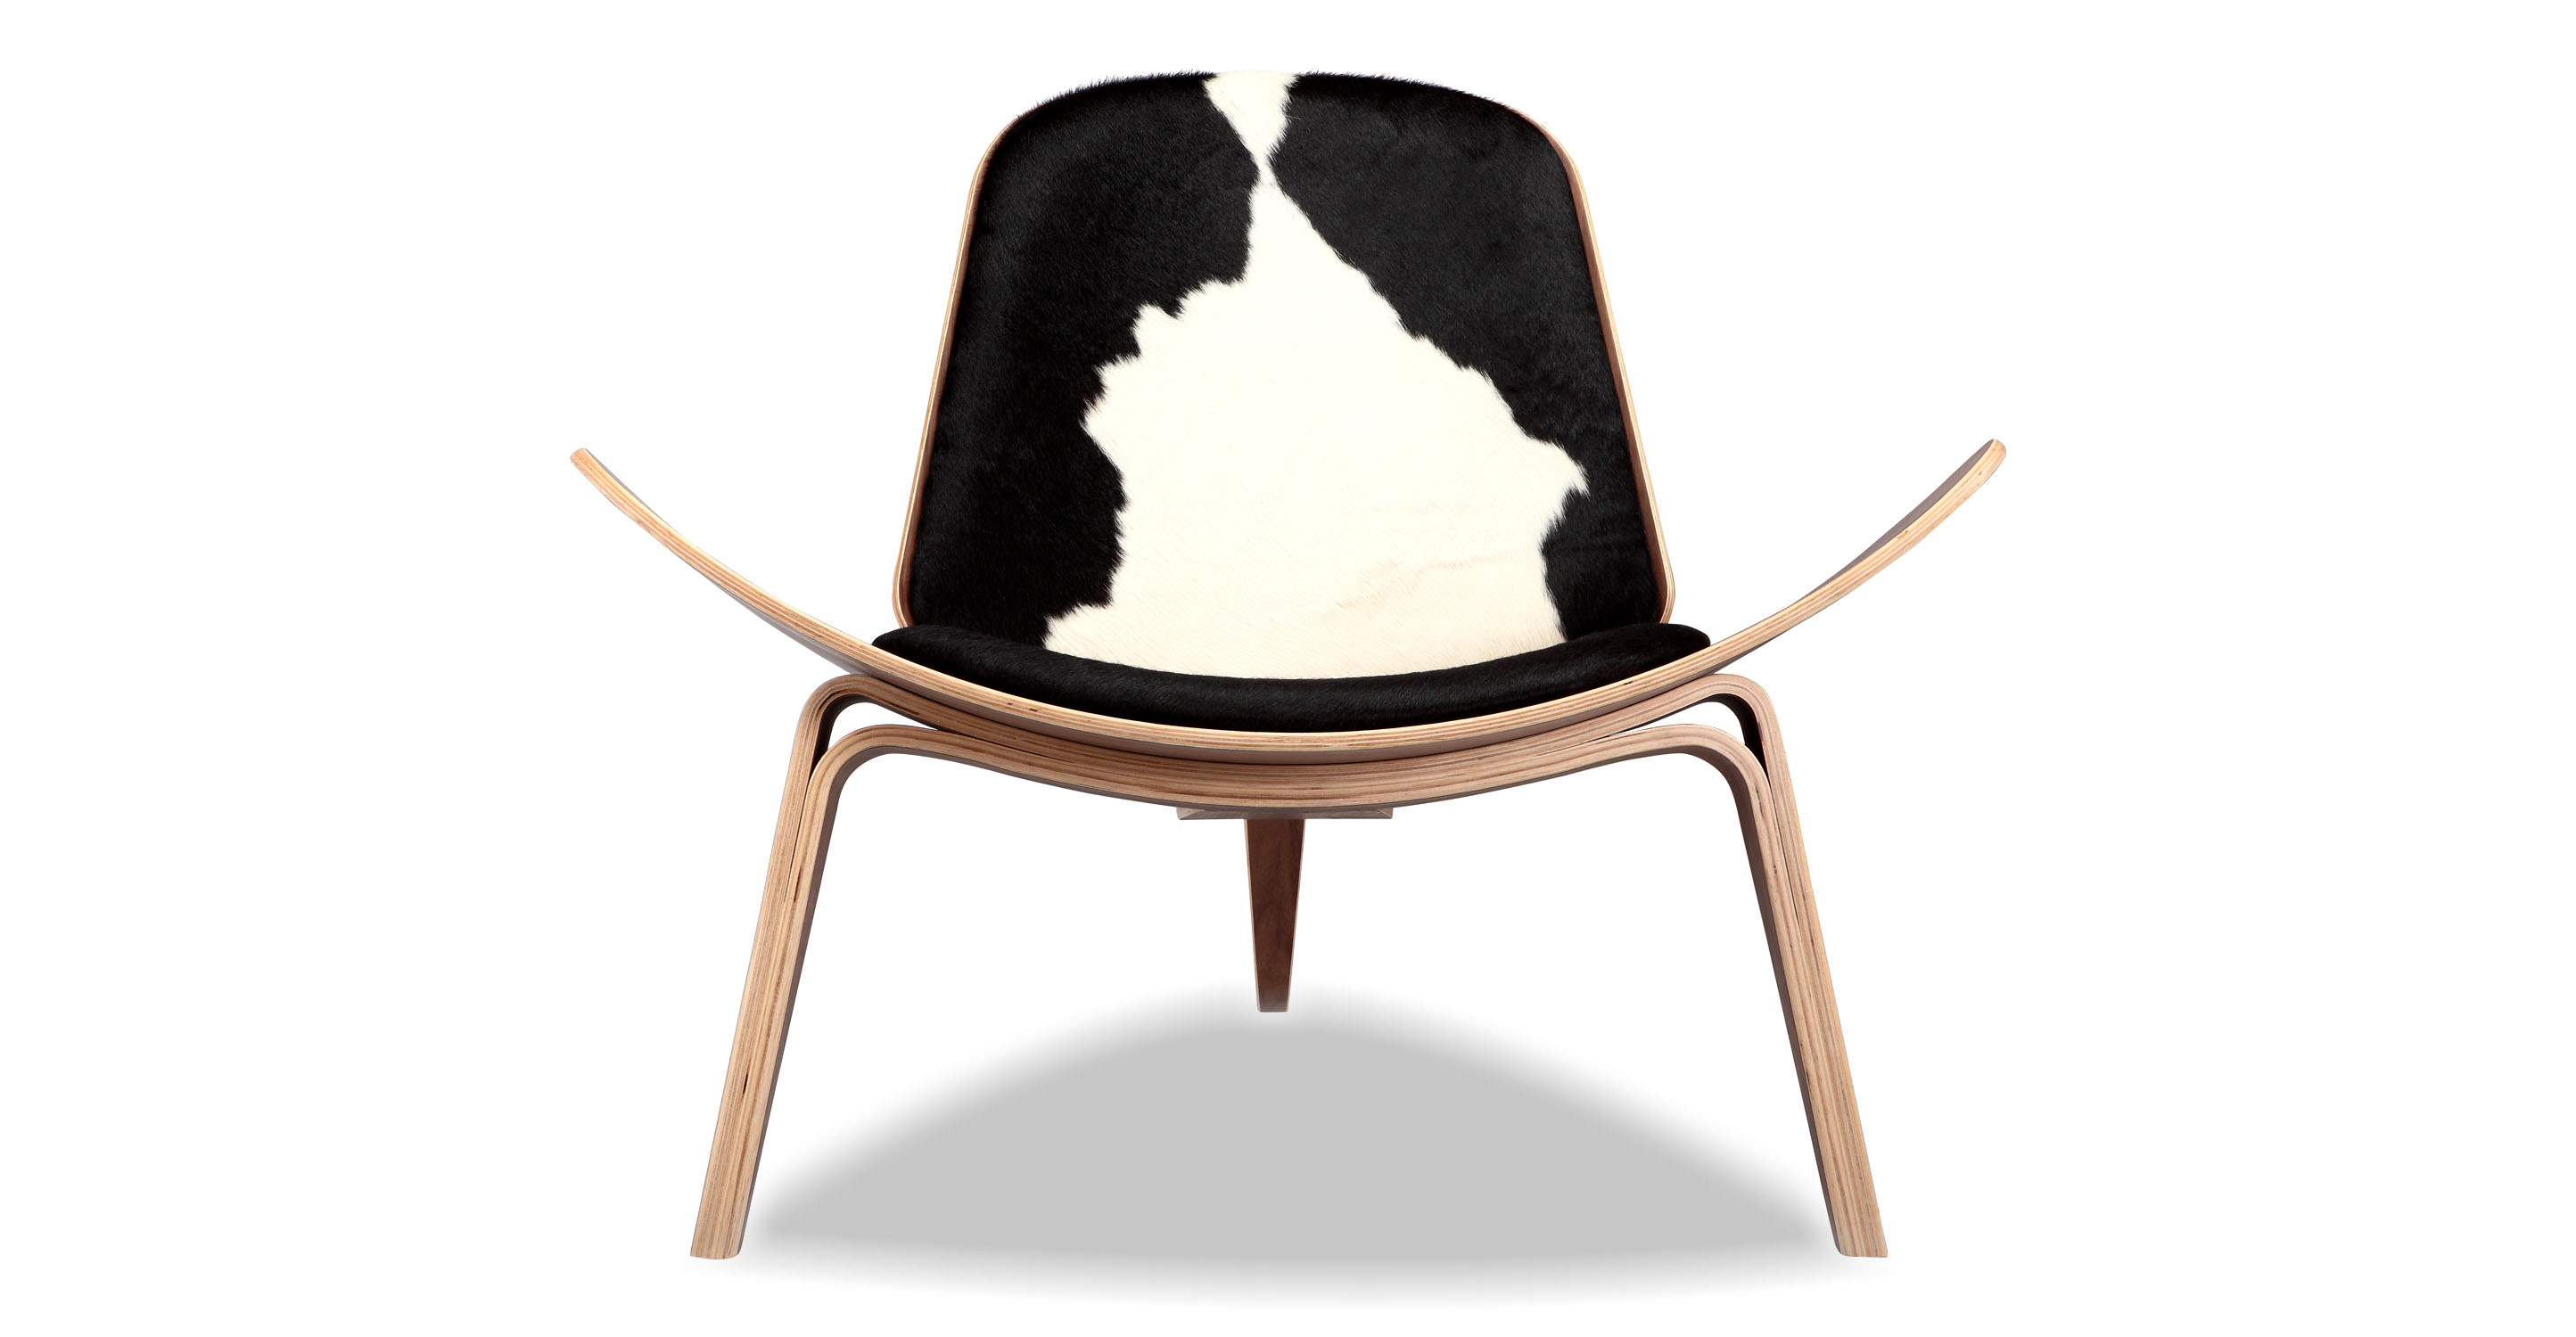 Tripod Leather Chair 2-pc Set, Walnut/Black & White Cowhide